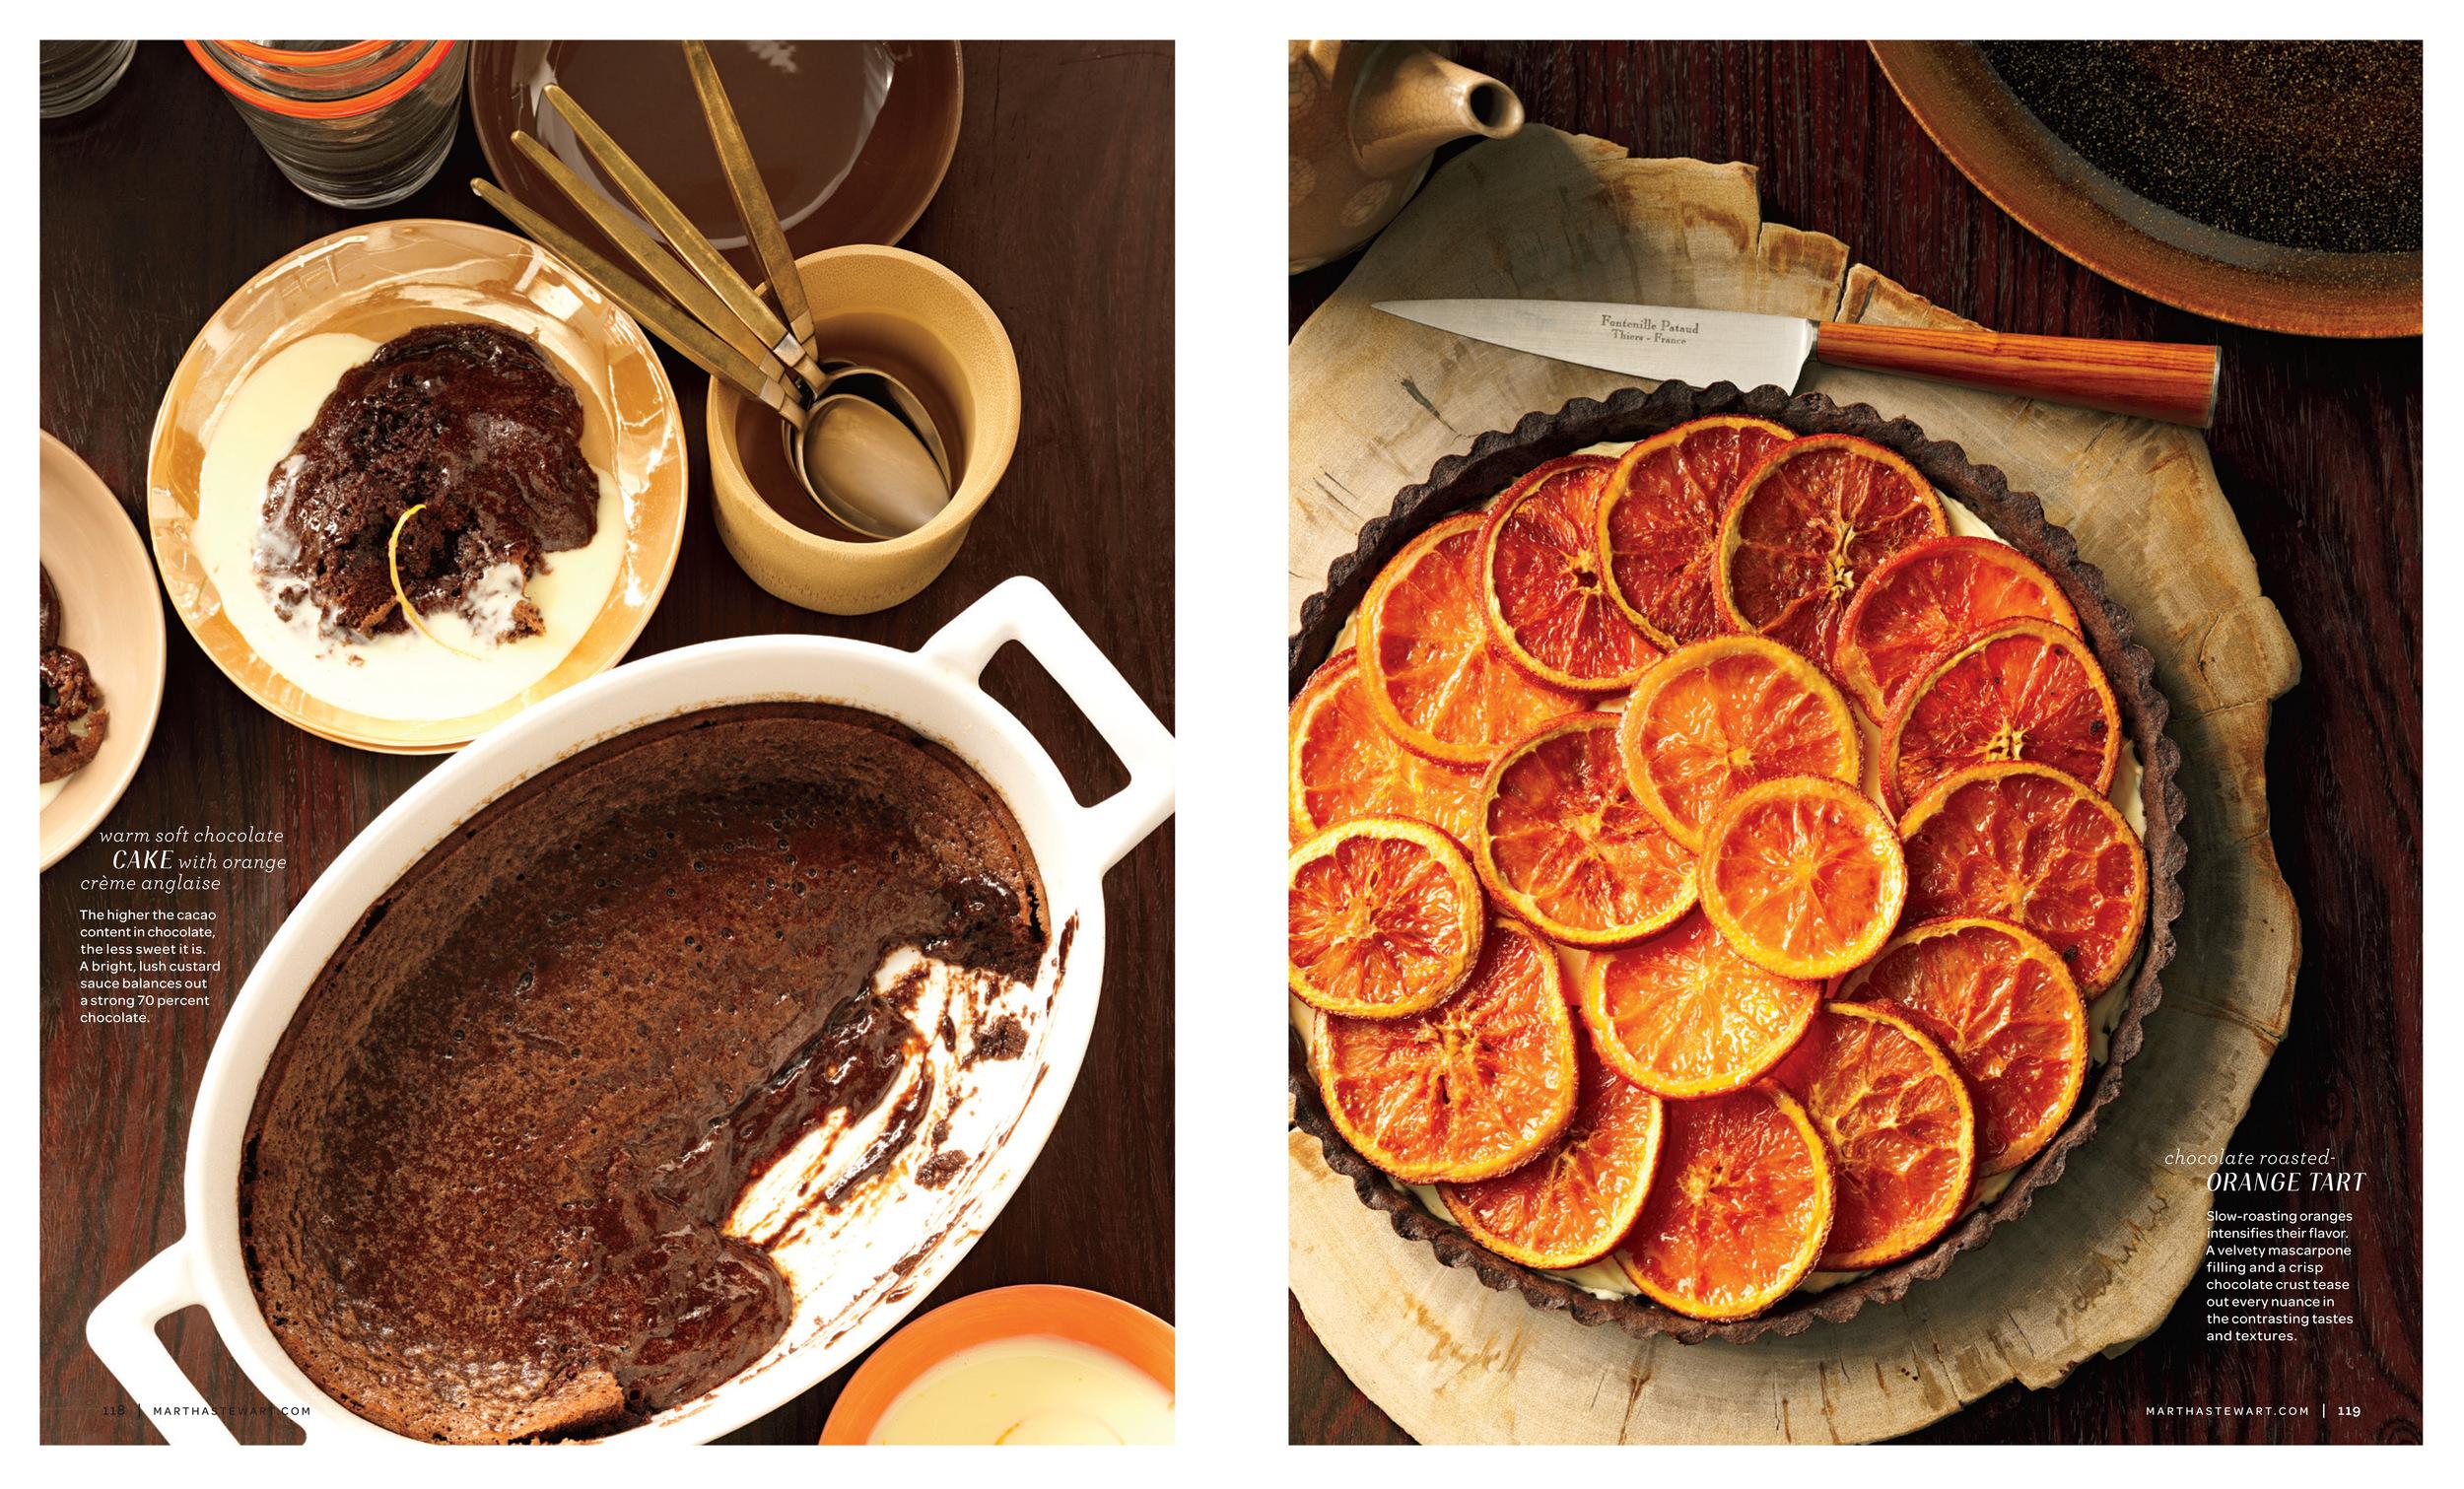 Citrus-and-chocolate-2-2.jpg